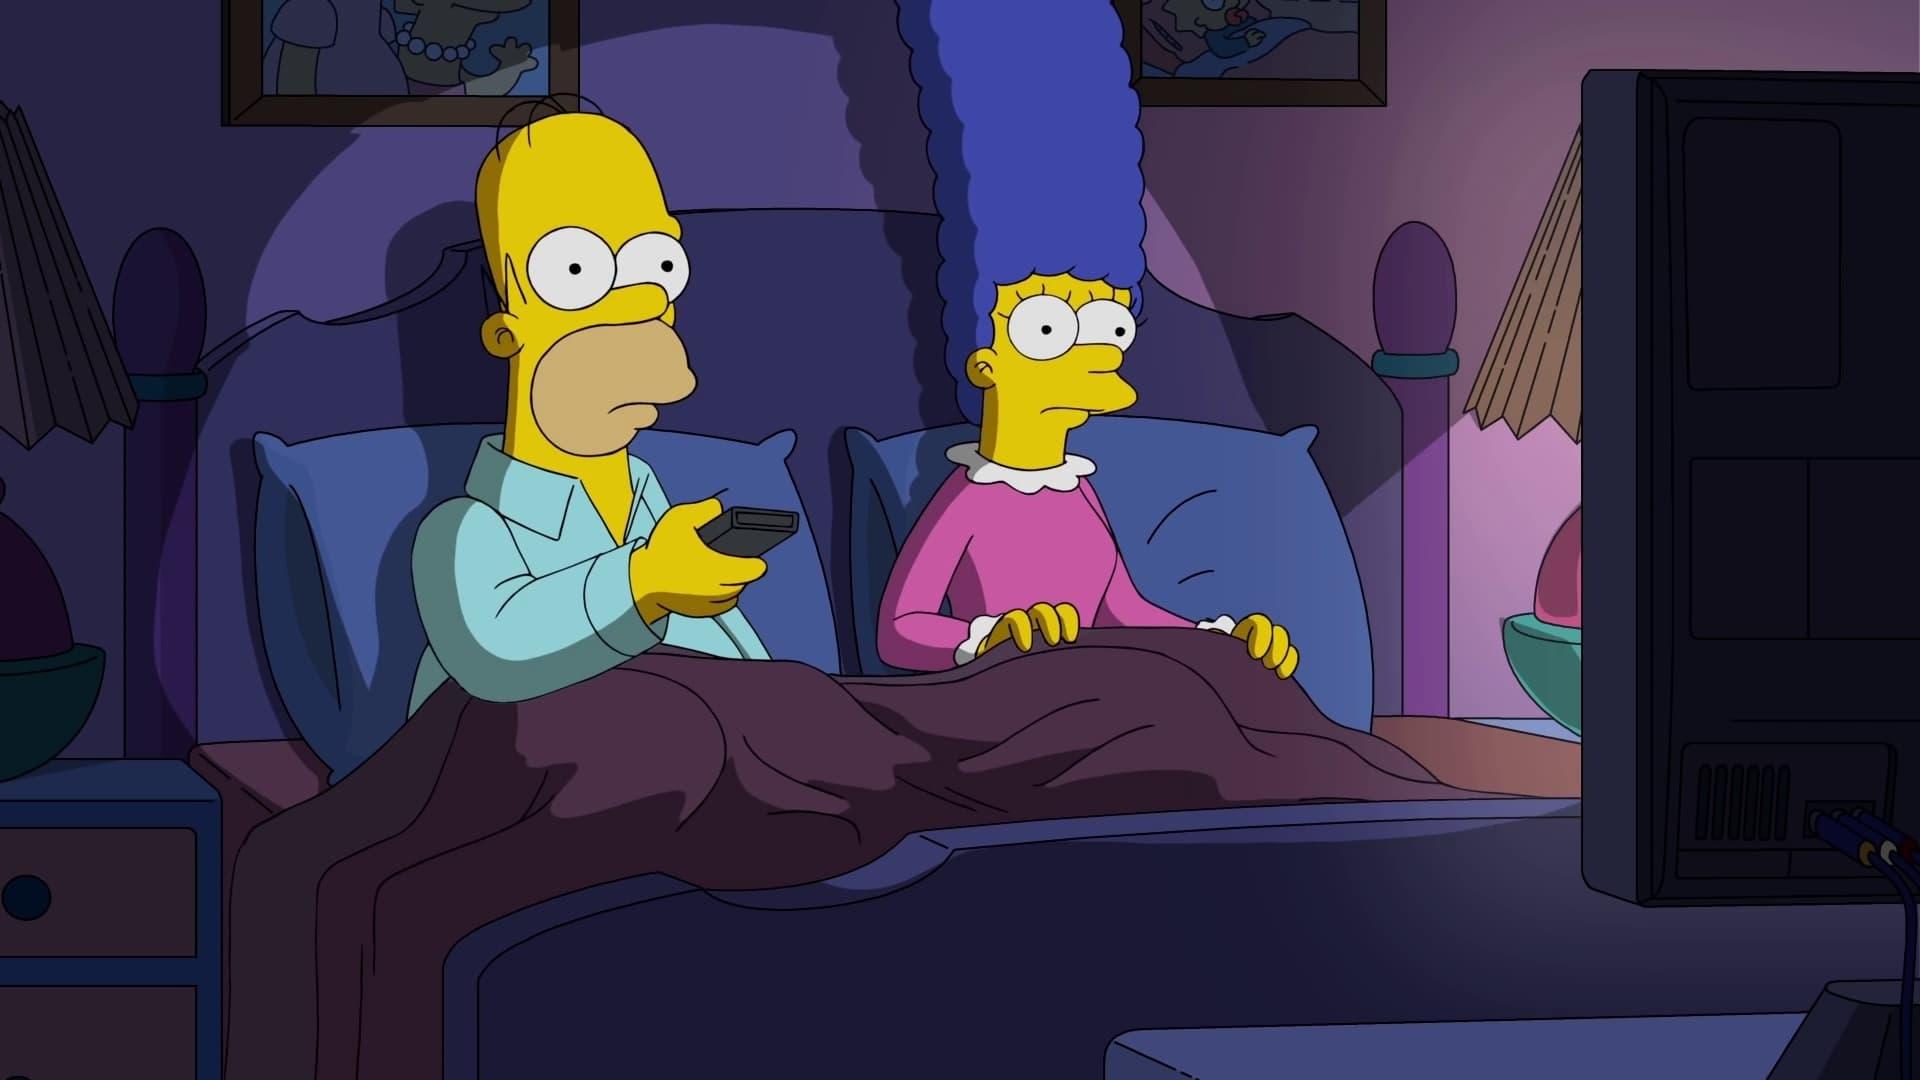 The Simpsons - Season 0 Episode 59 : 3 a.m.